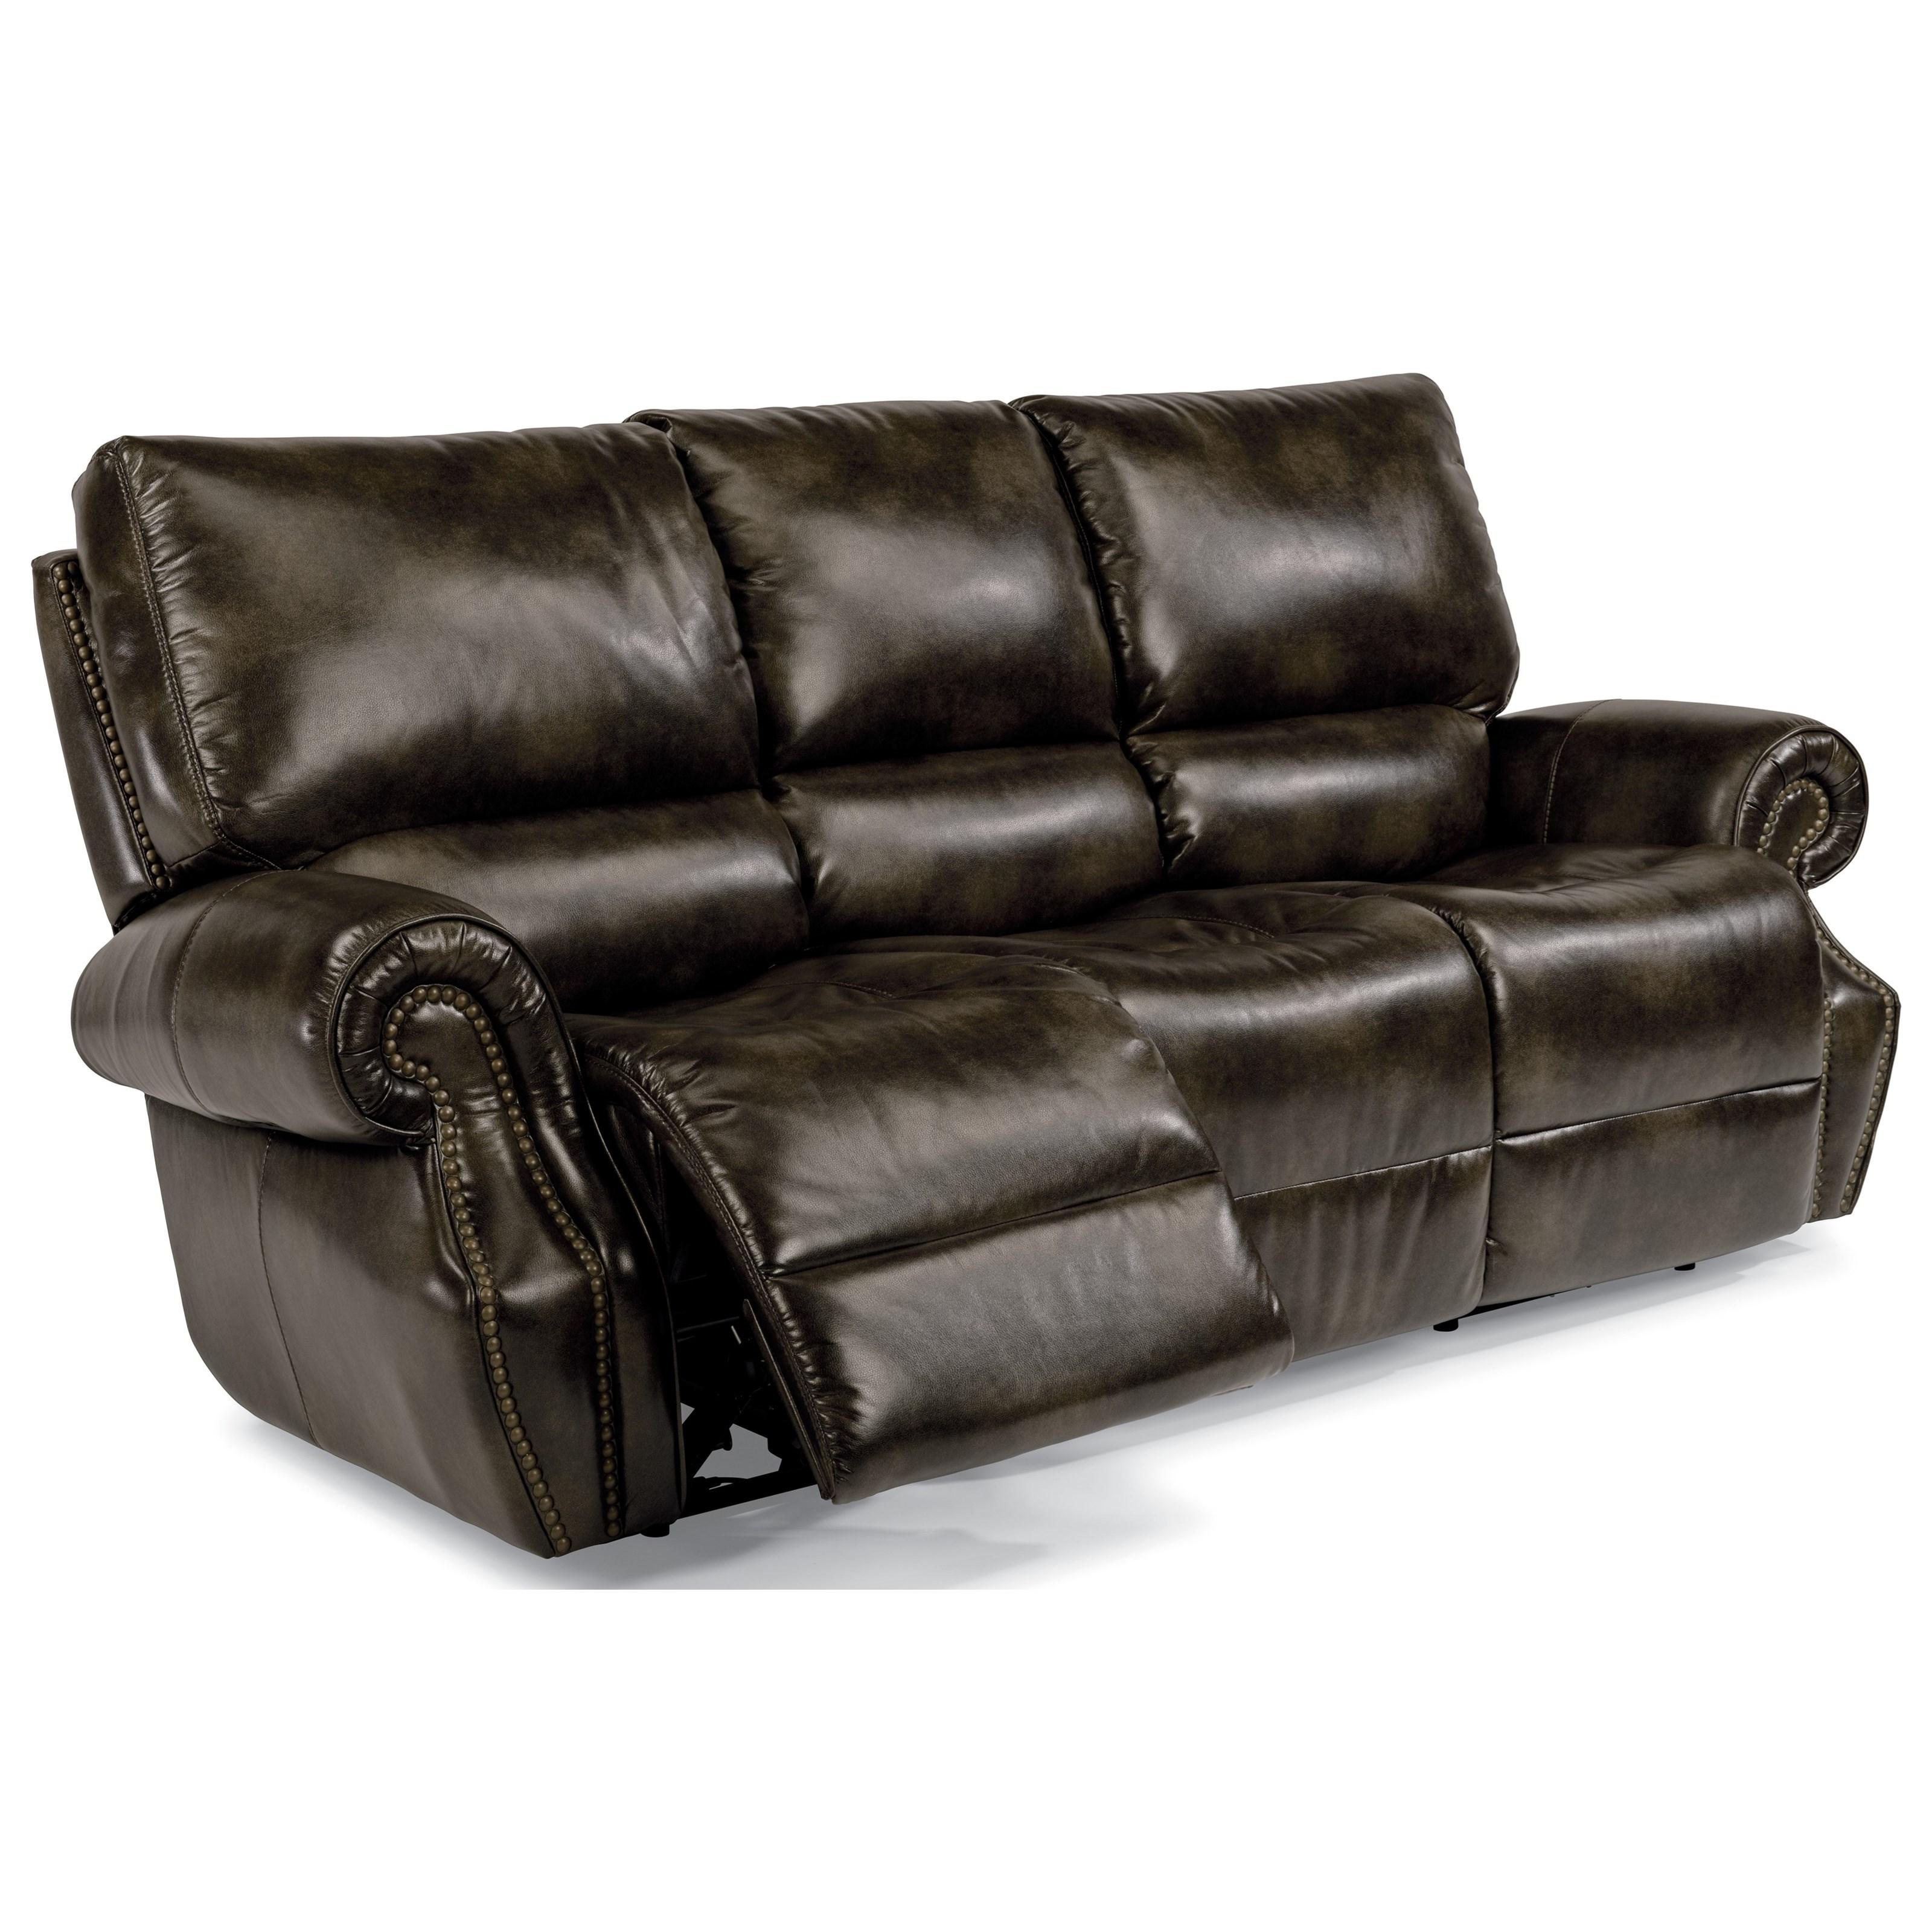 Flexsteel Latitudes-Colton Power Rcl Sofa w/ Pwr Headrest - Item Number: 1582-62PH